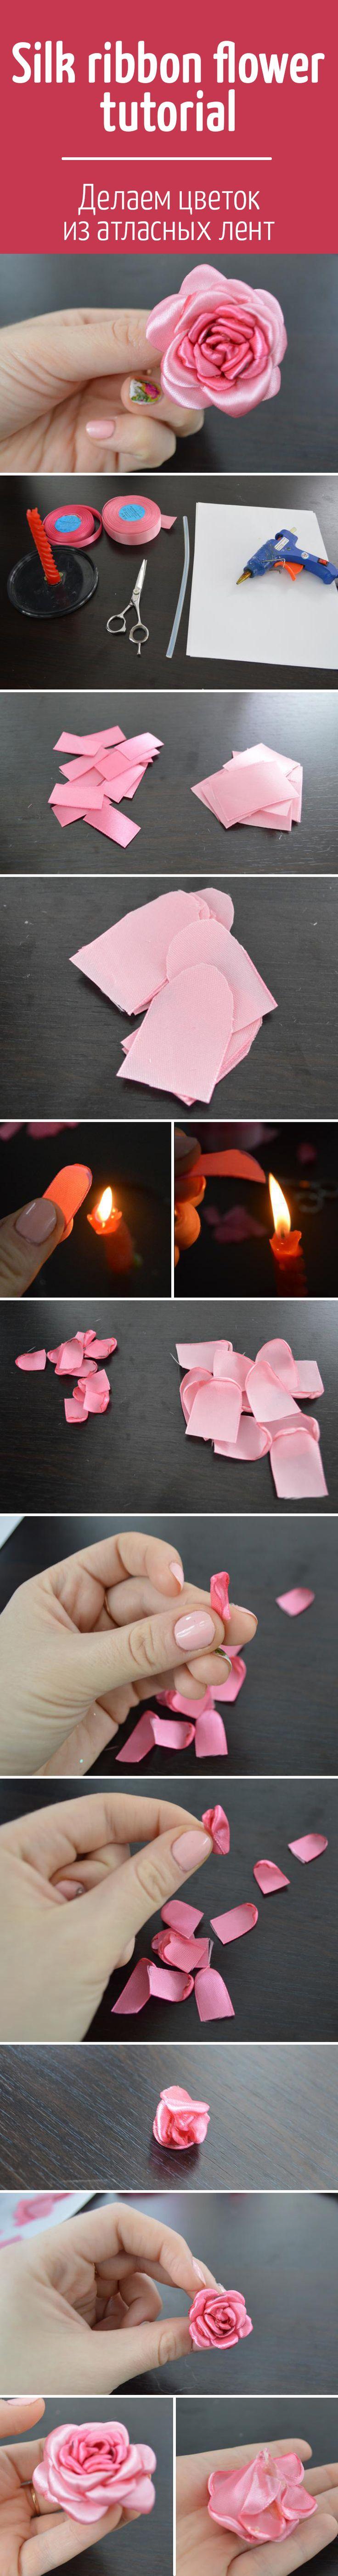 Делаем цветок — бутон розы из атласных лент / Silk ribbon flower tutorial